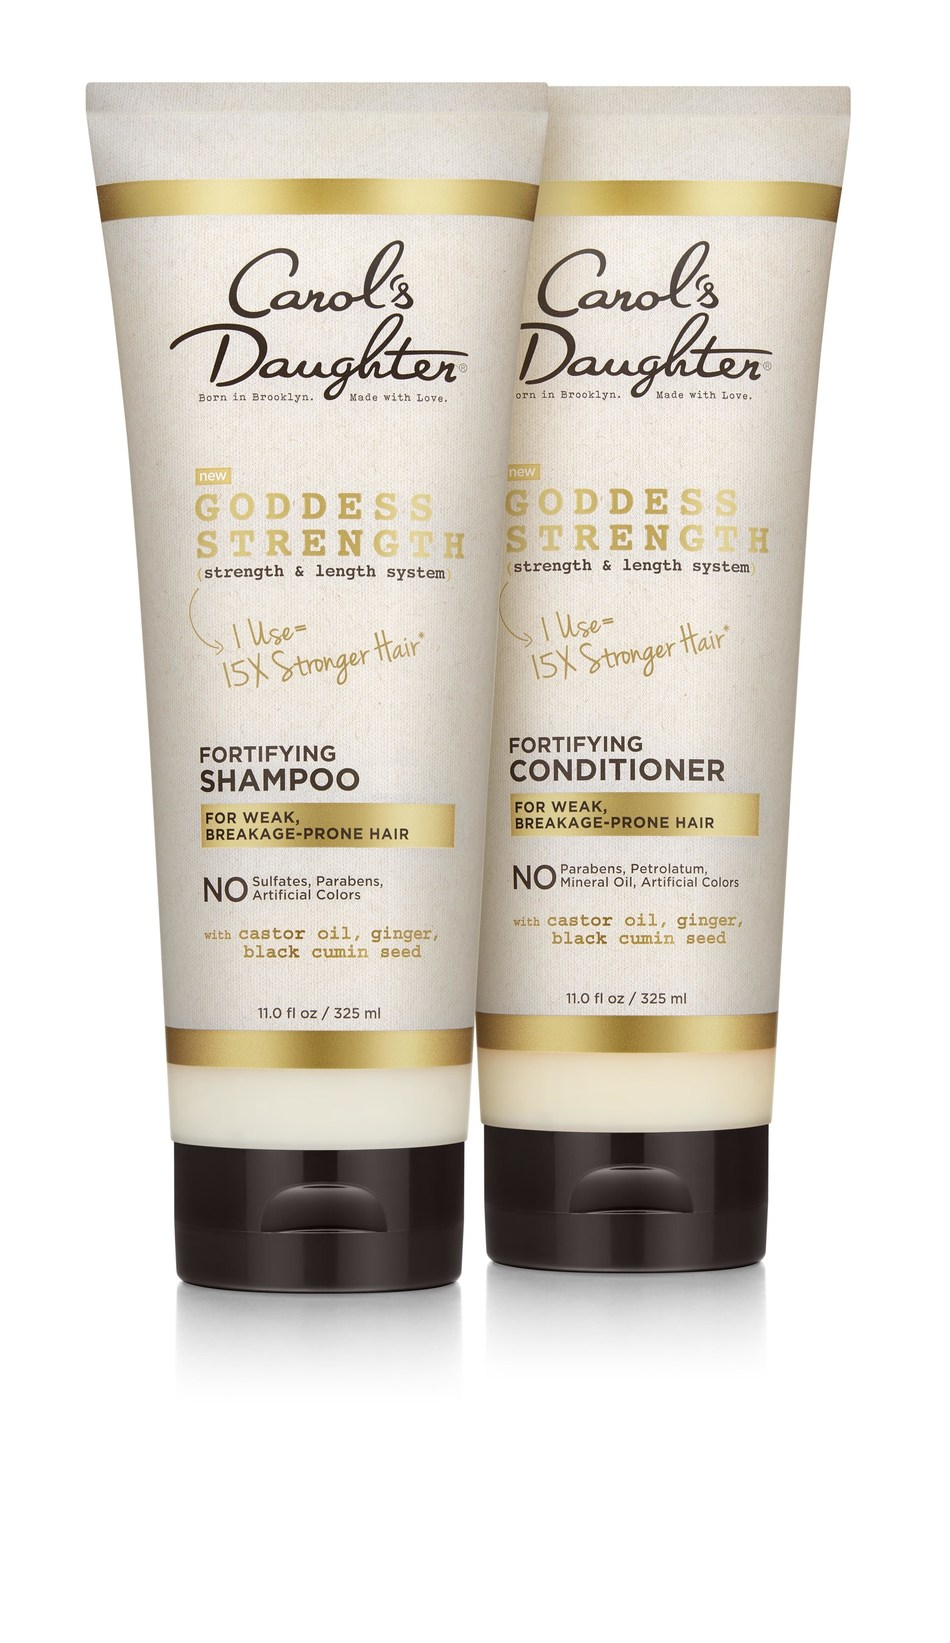 Carol's Daughter Goddess Strength Shampoo and Conditioner